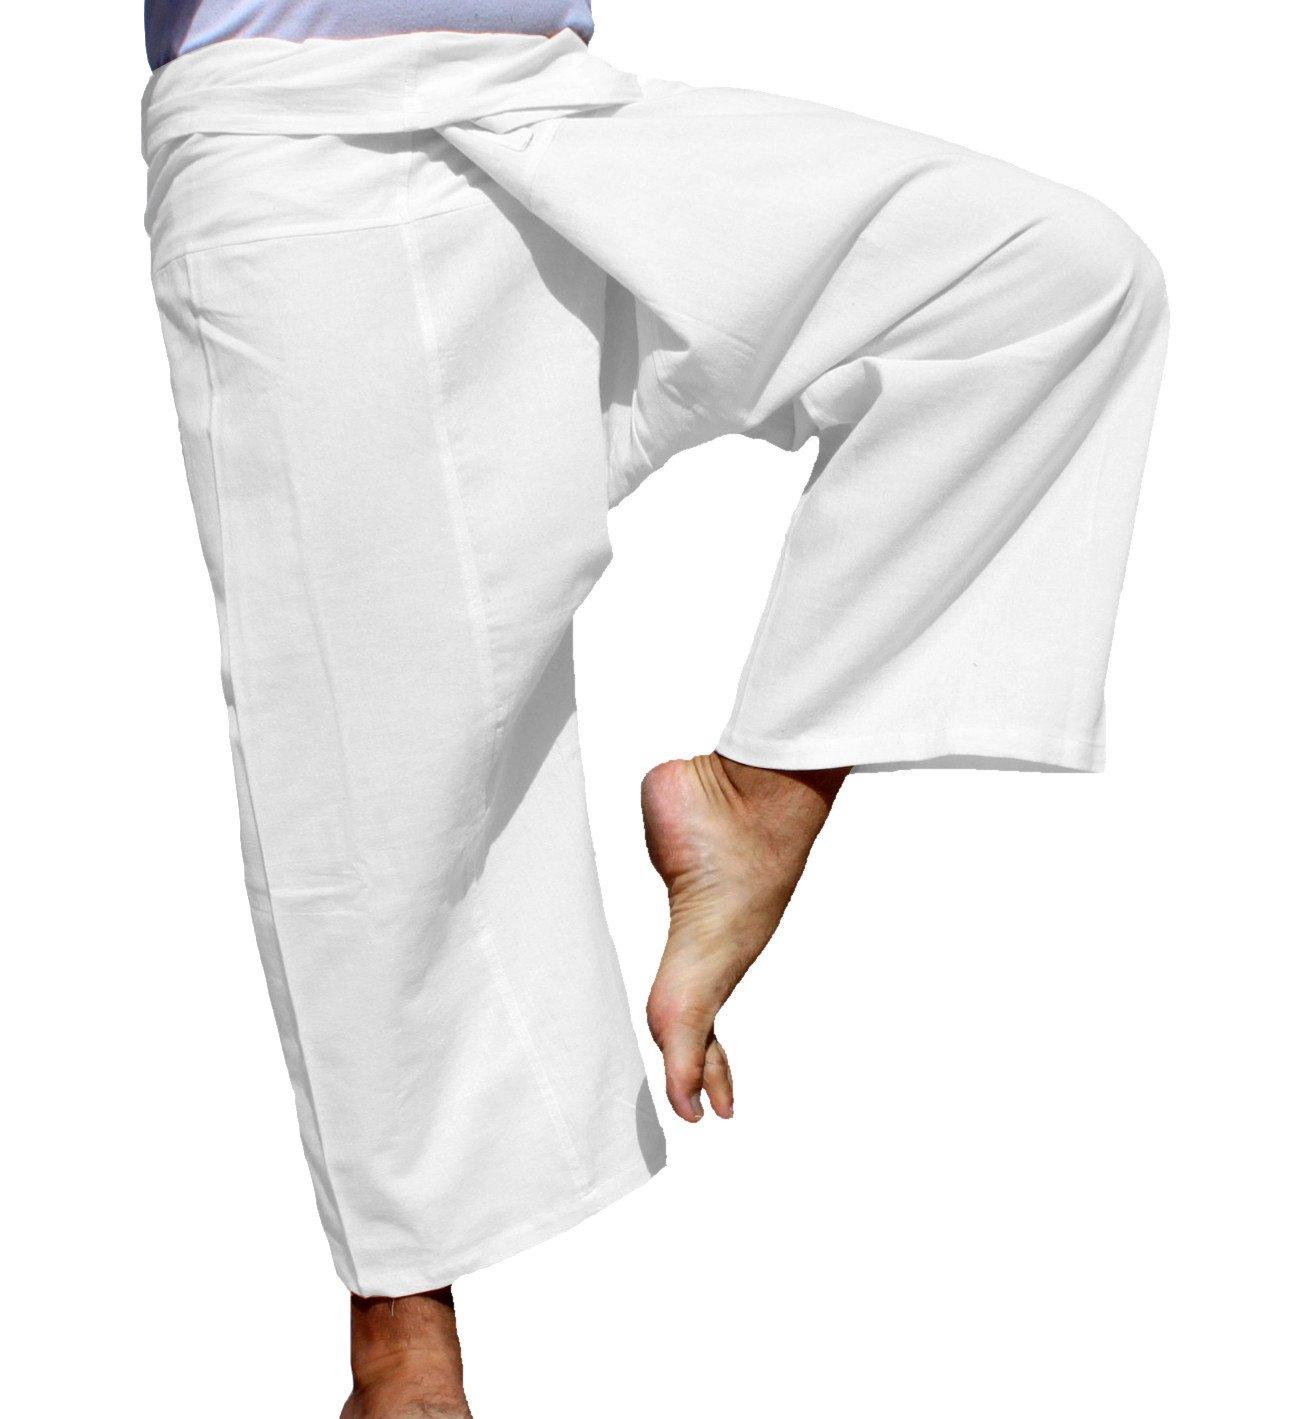 Raan Pah Muang RaanPahMuang Brand Light Summer Cotton Thai Plain Fisherman Wrap Pants Tall Cut, X-Large, White by Raan Pah Muang